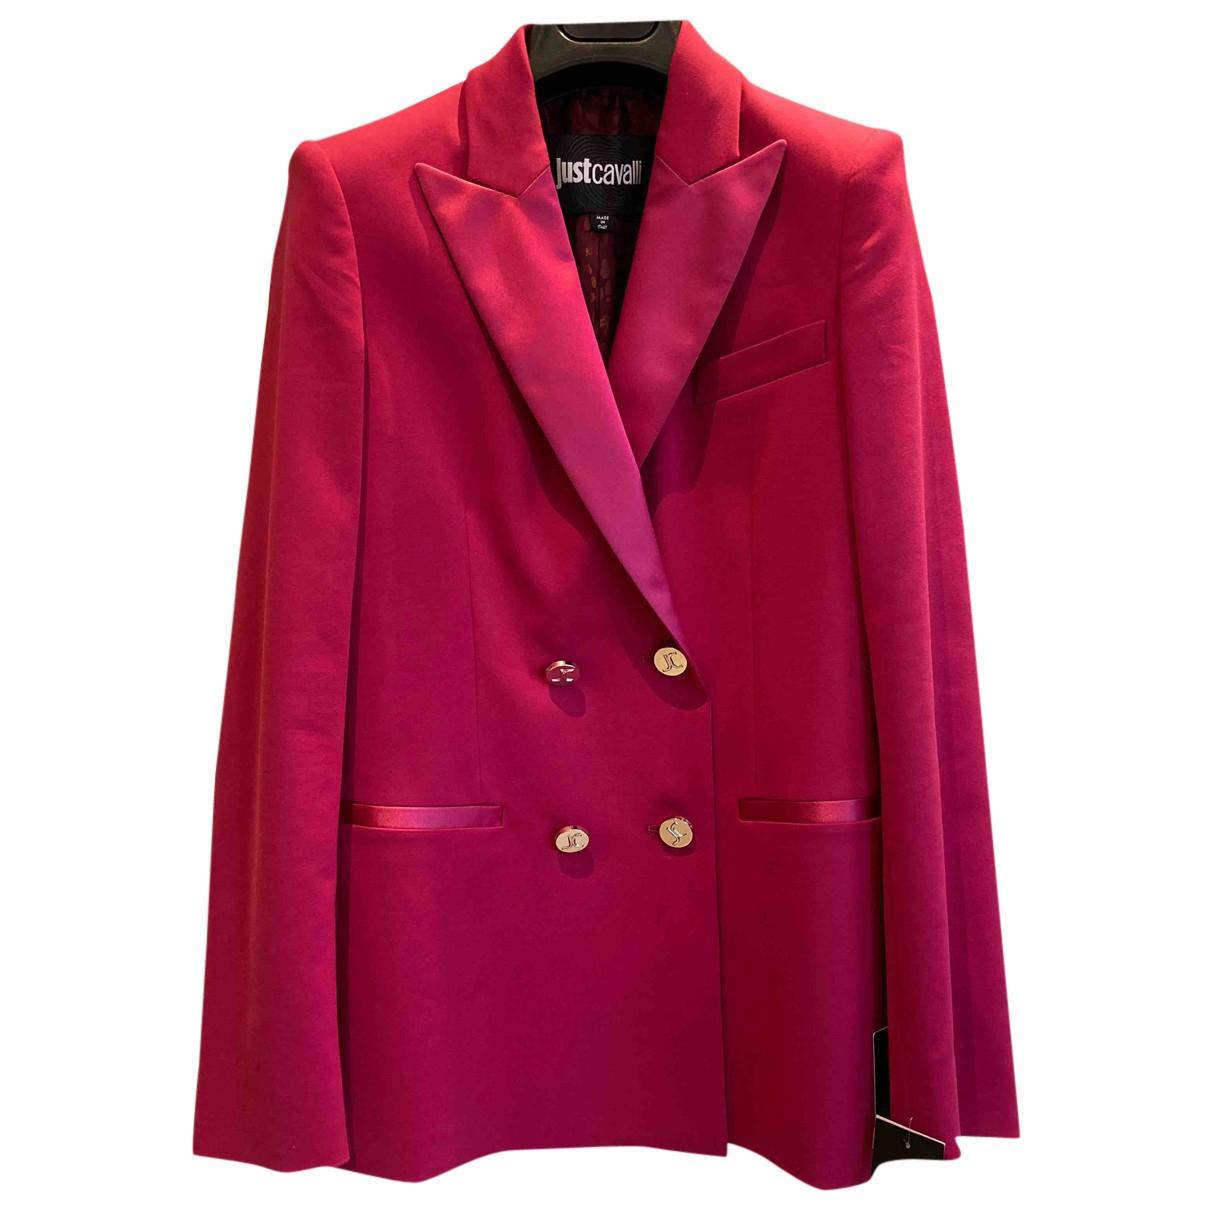 Just Cavalli - Veste   pour femme - rose